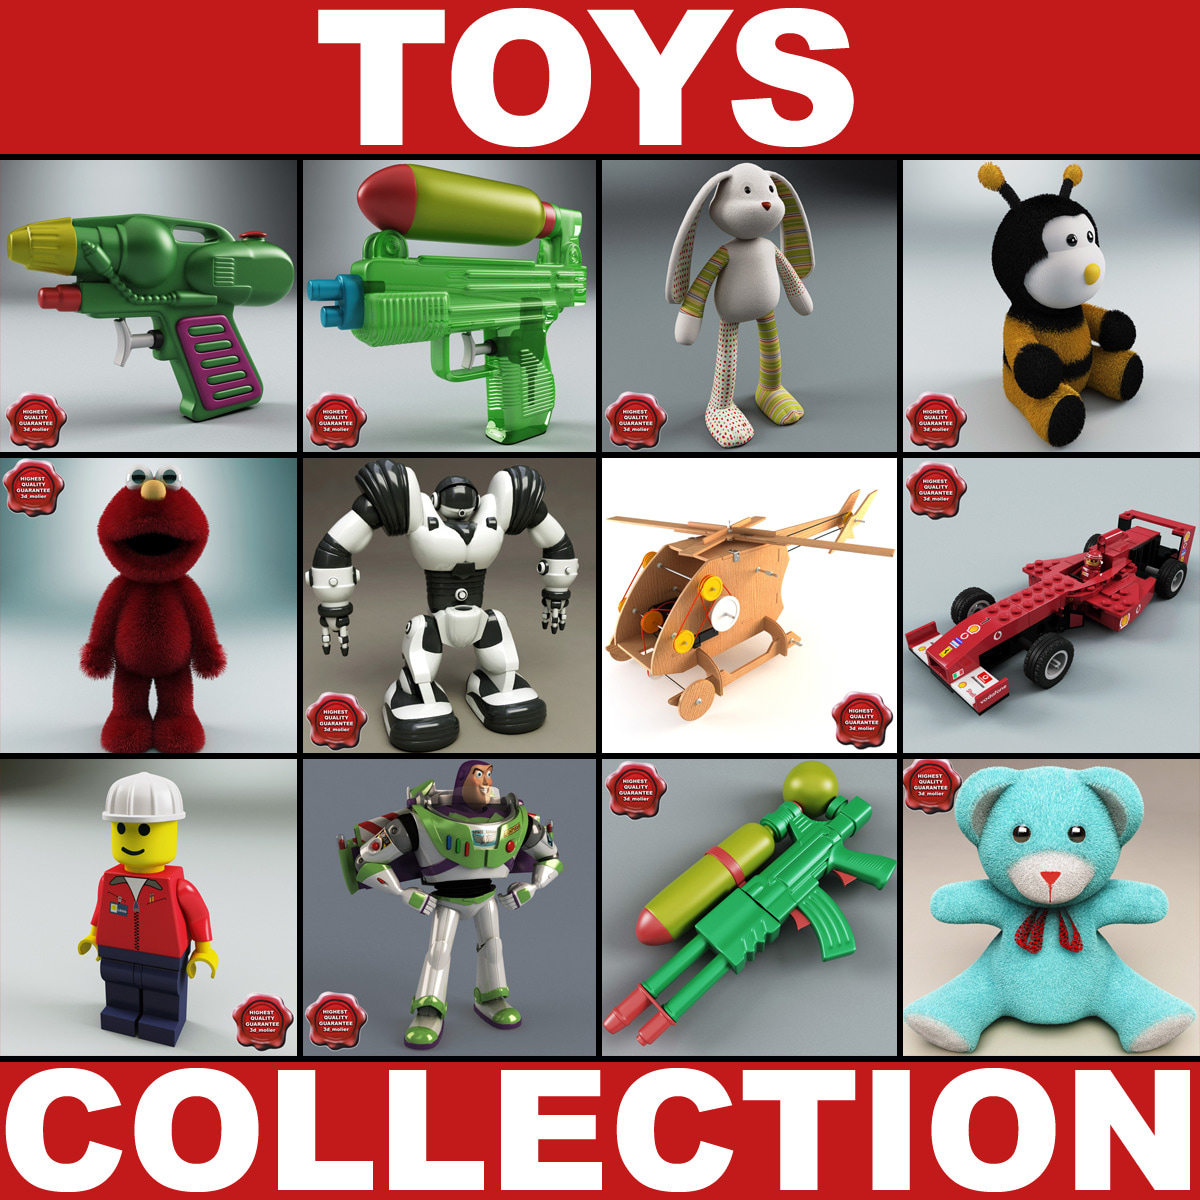 Toys_Collection_V4_000.jpg